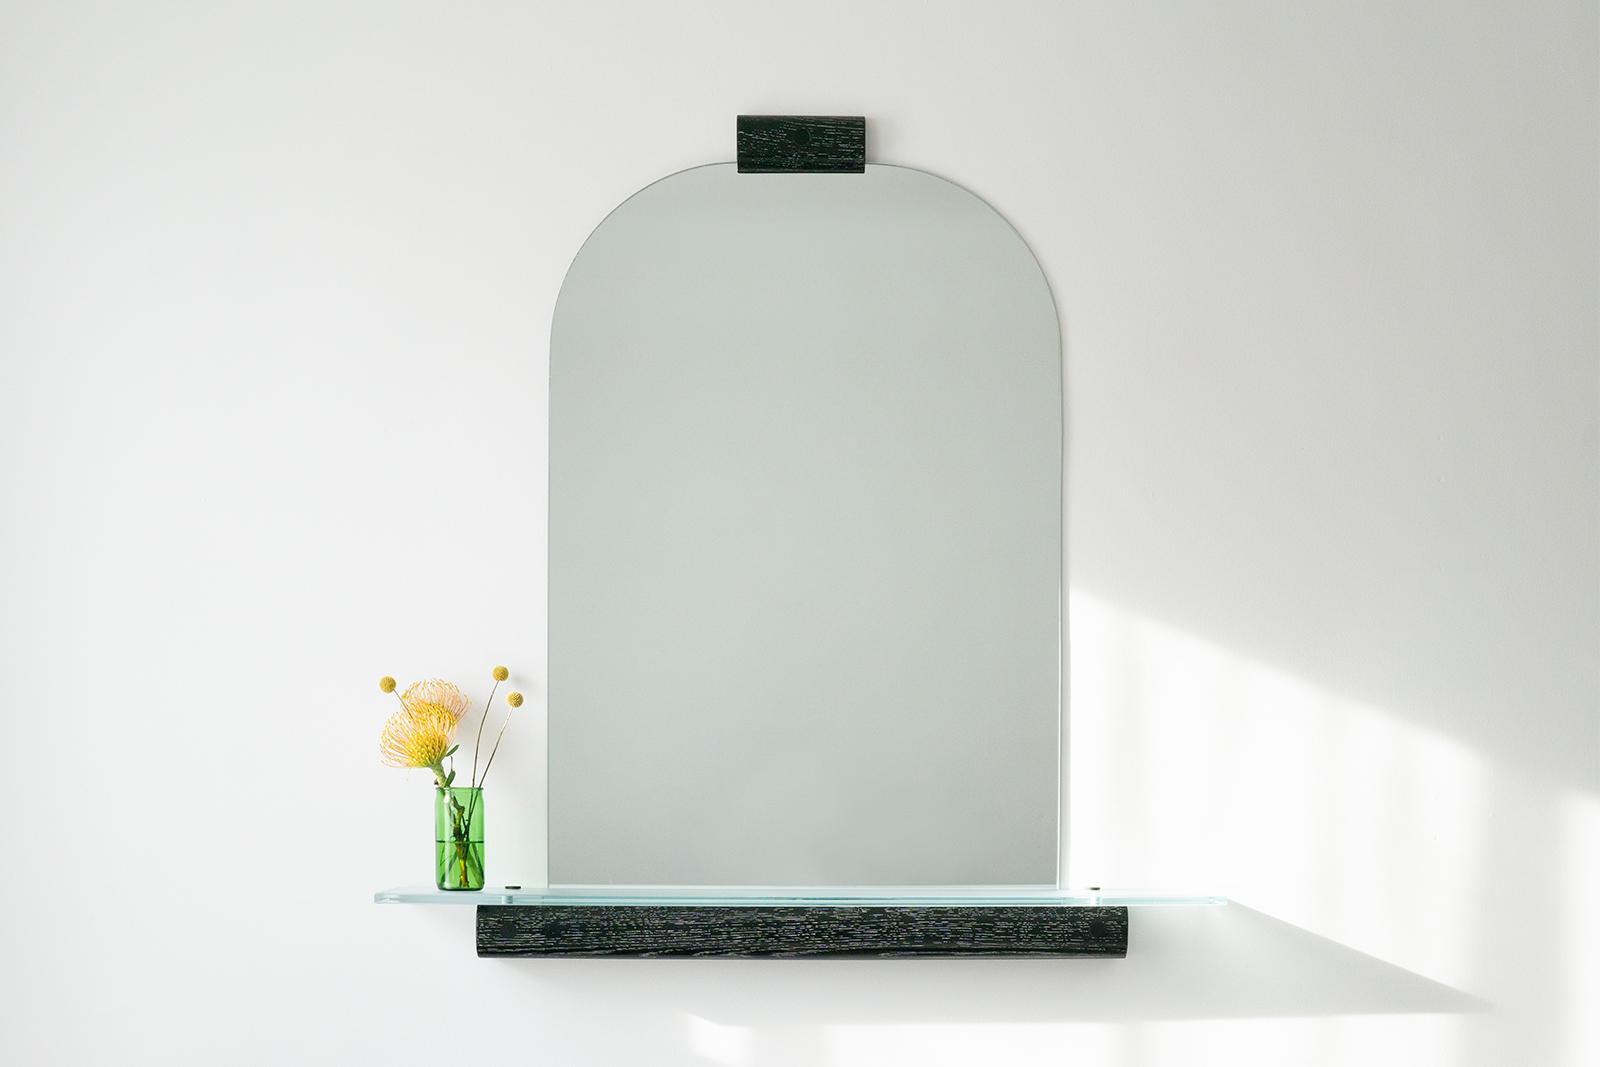 durodeco_Strata Mirror (6).jpg